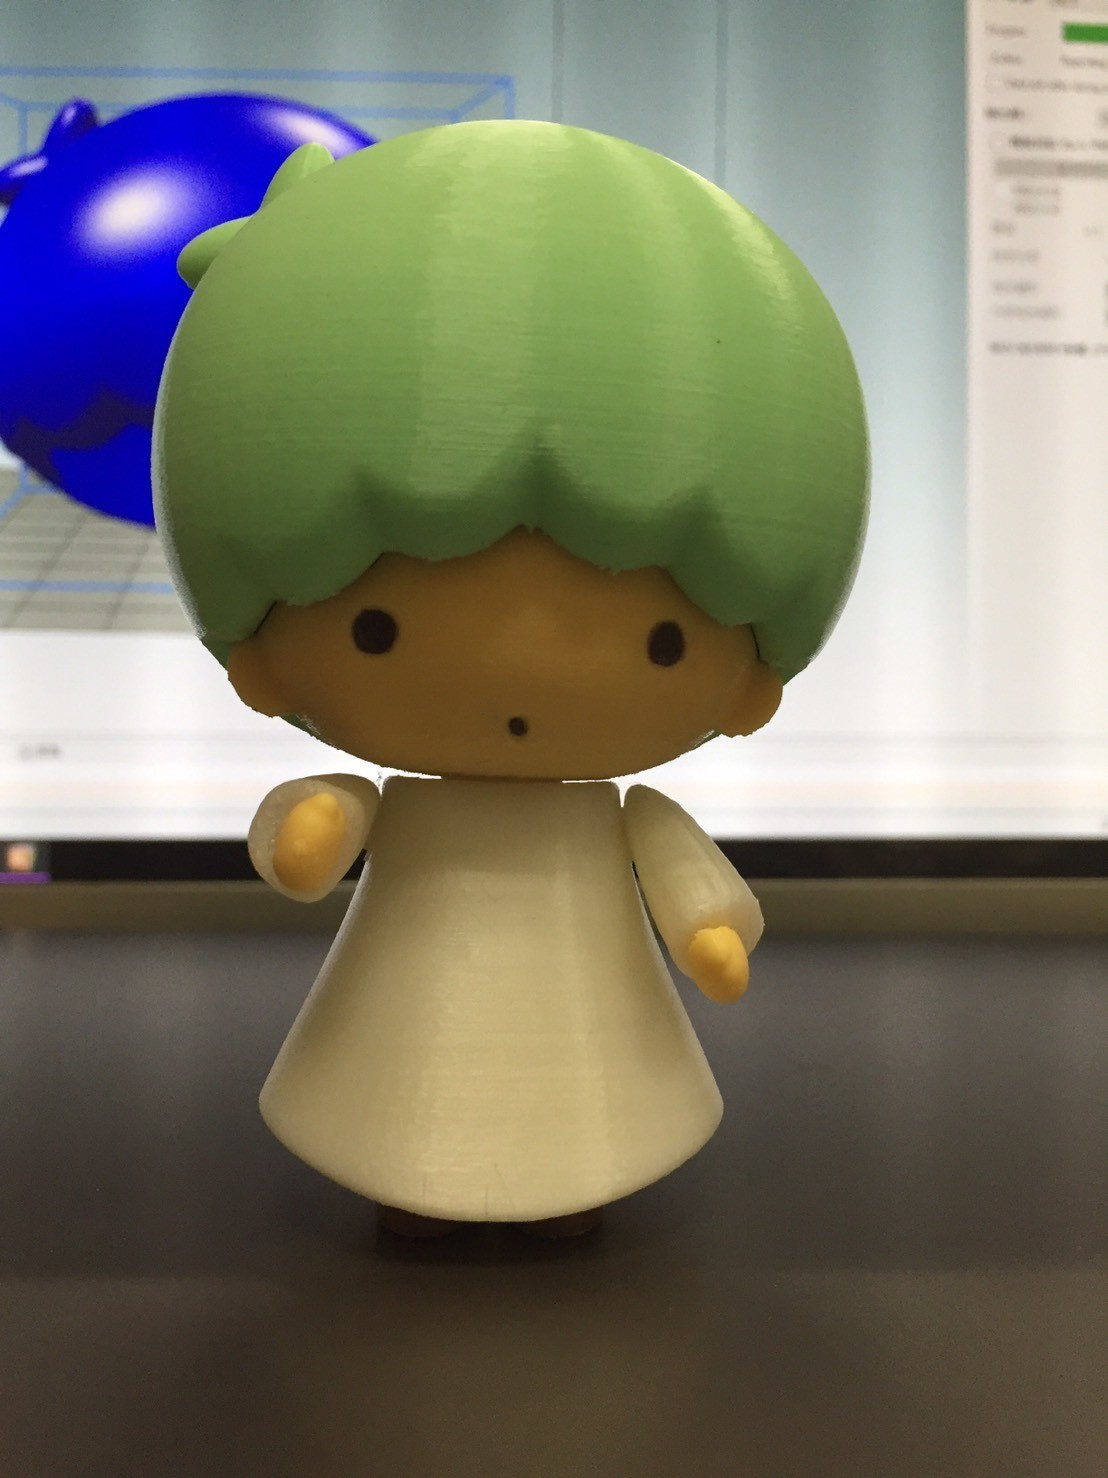 42096.jpg Download free STL file Little Twin Stars / リトルツインスターズ / 雙子星 -- Kiki(キキ) • 3D printing design, 86Duino